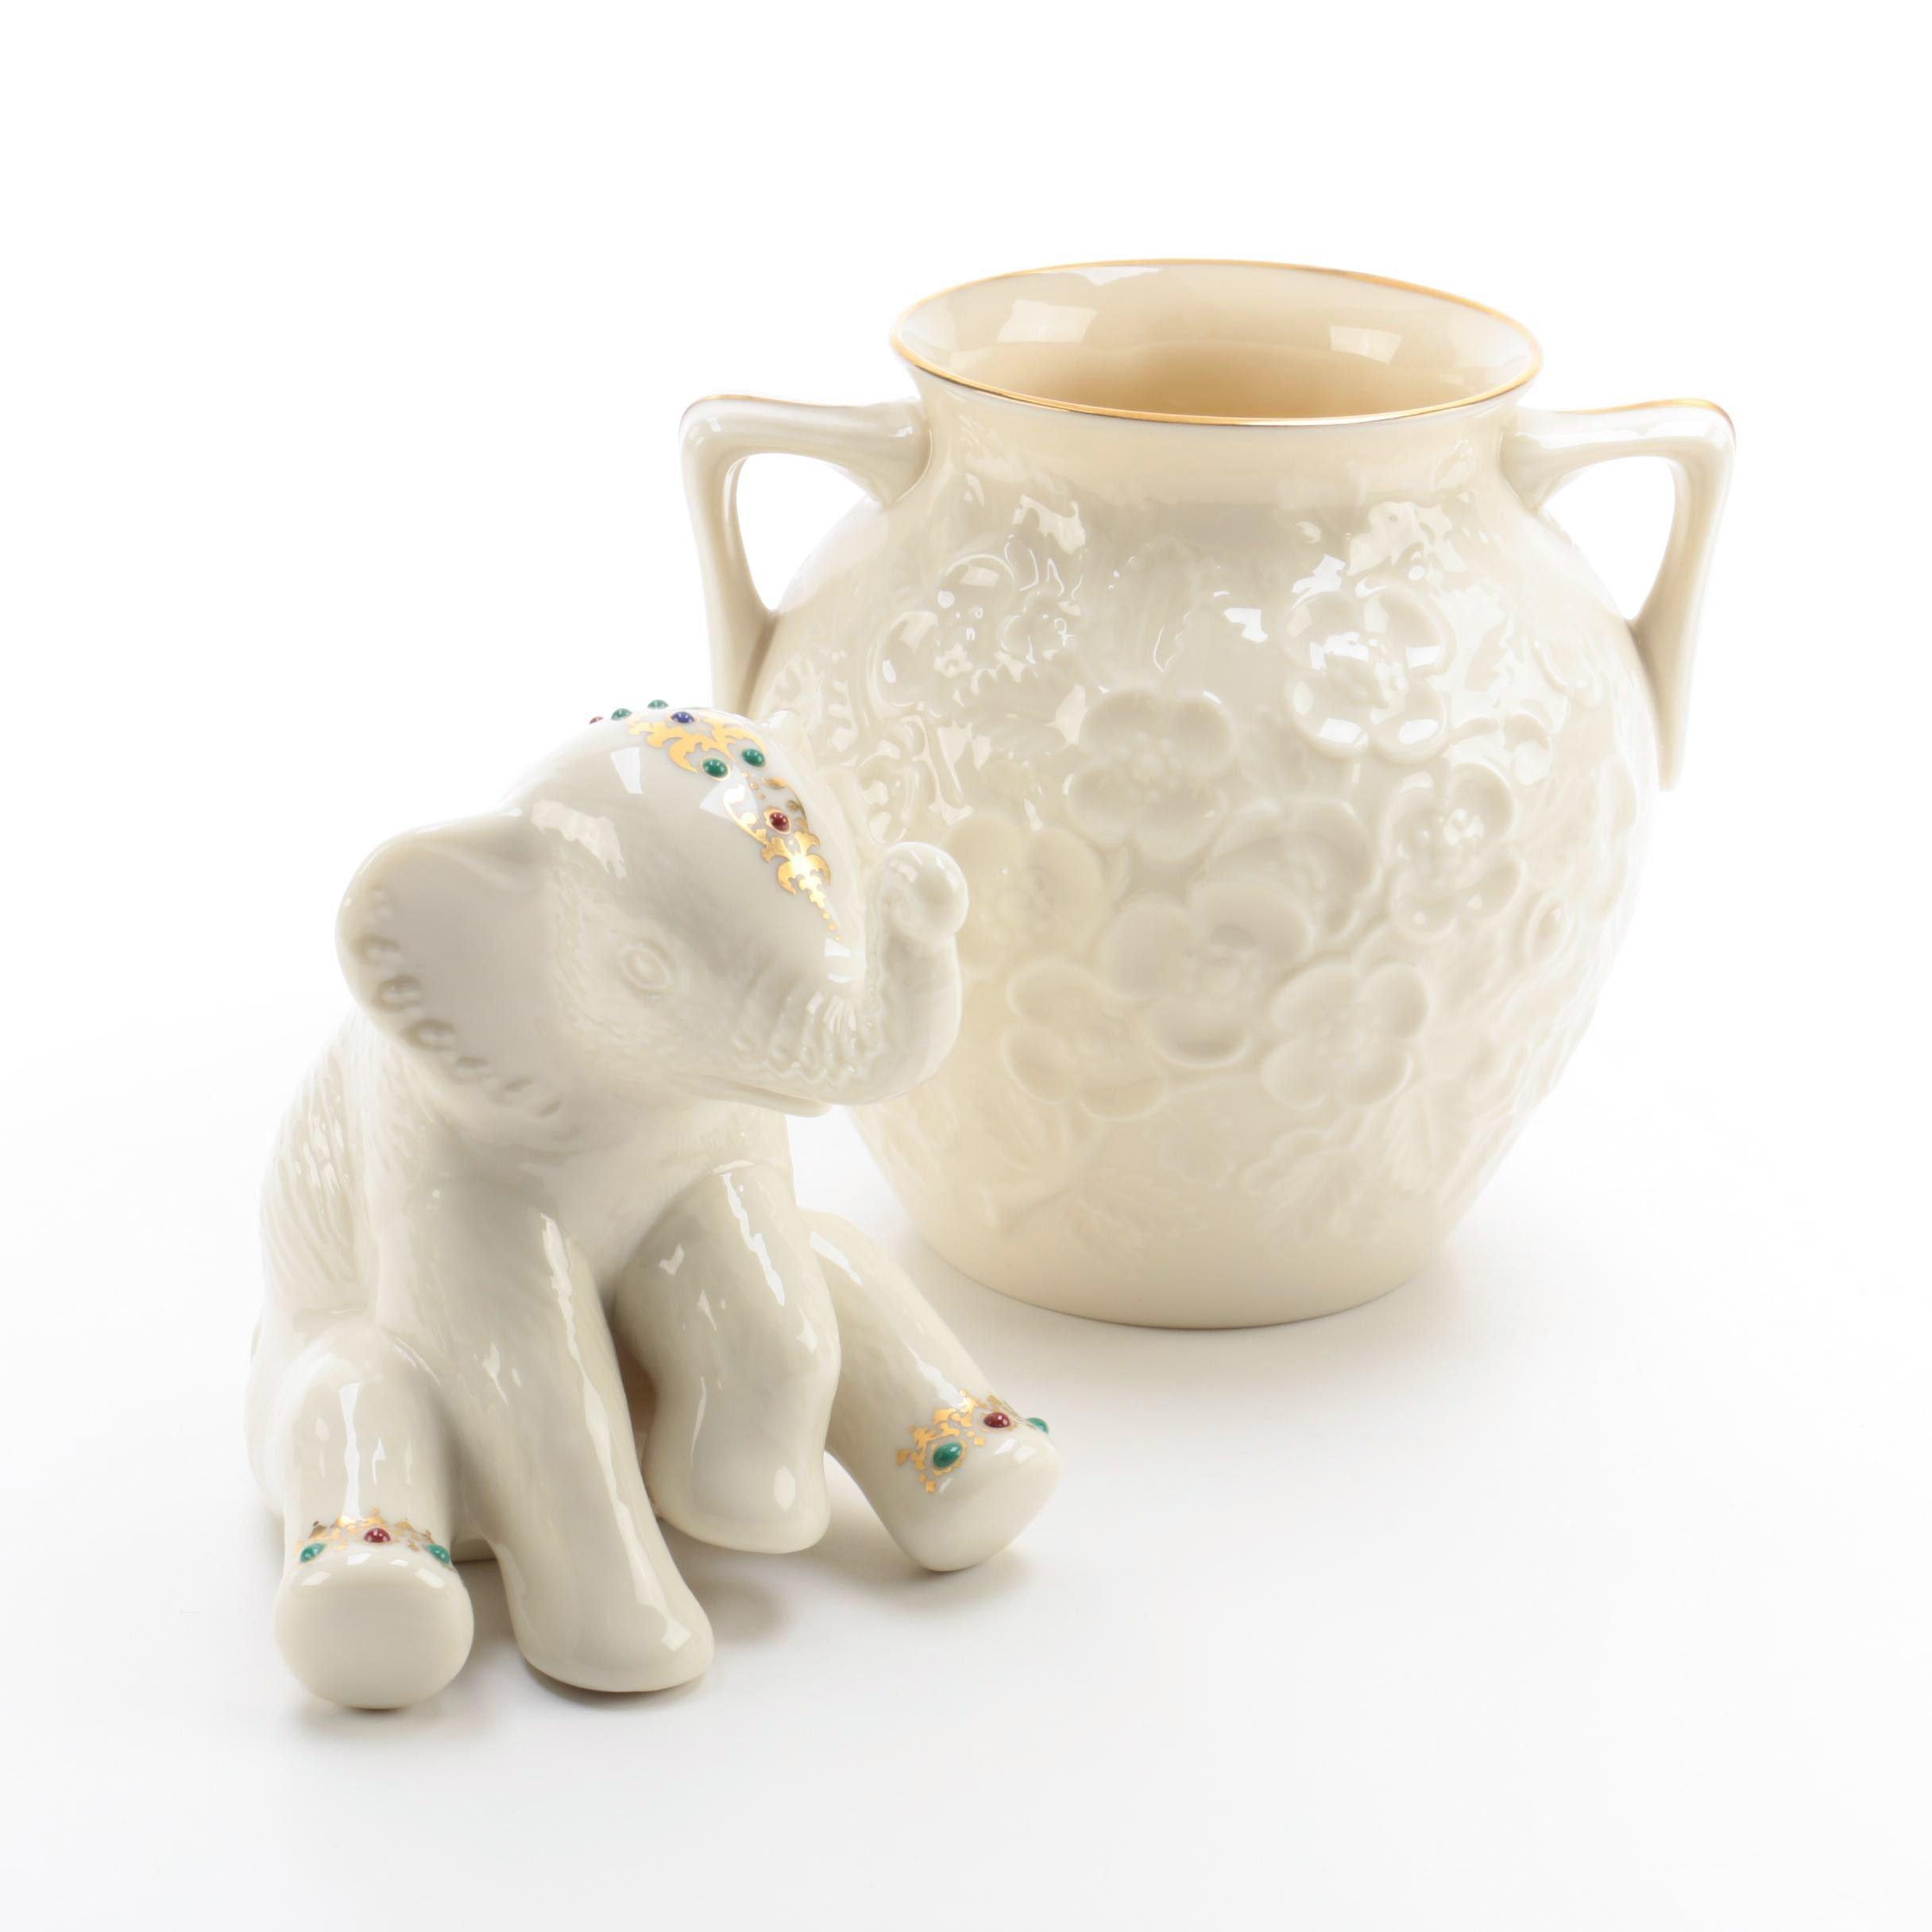 Lenox Porcelain Elephant Figurine and Vase